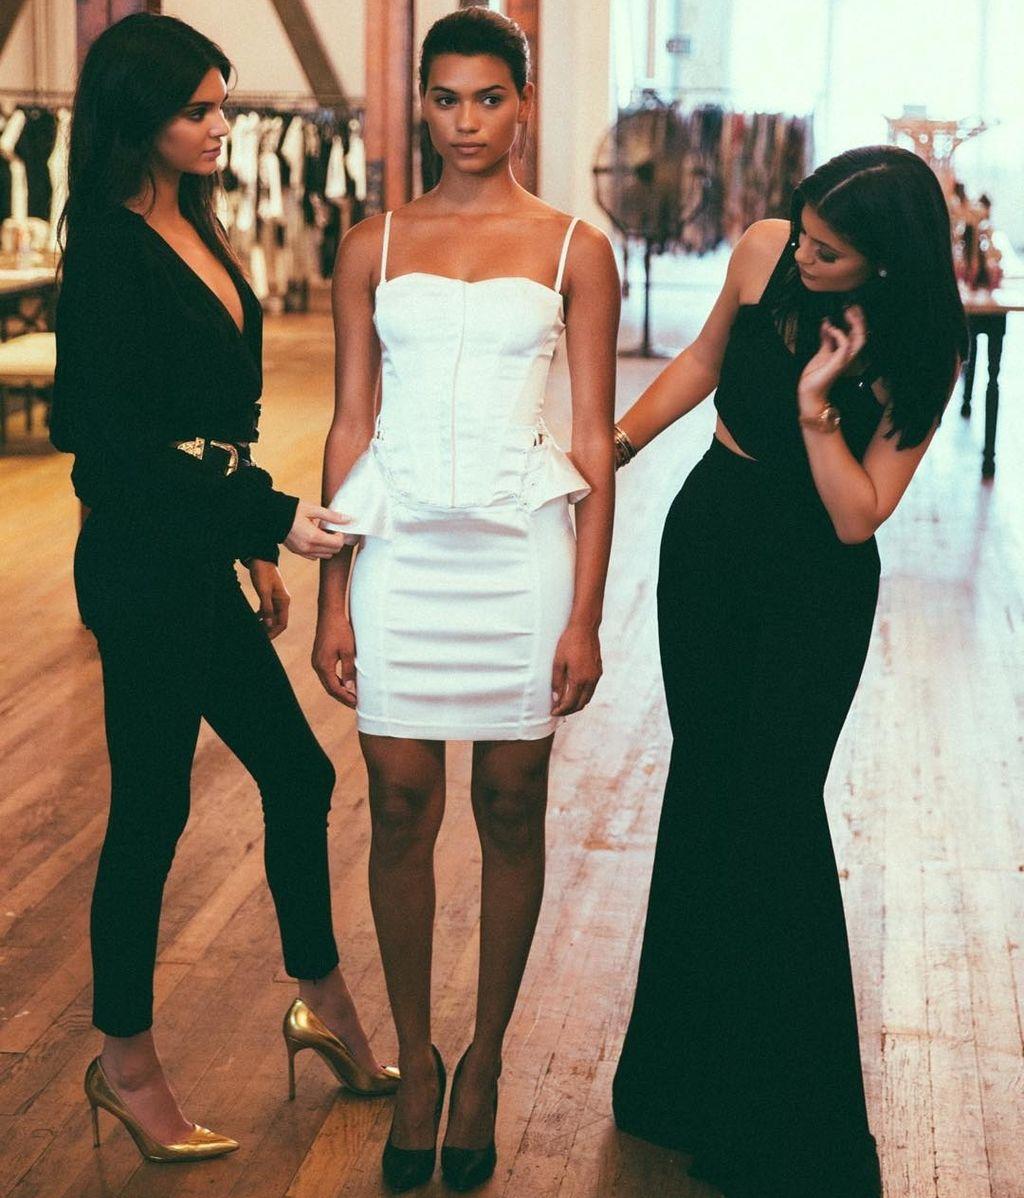 Kylie y Kendall Jenner debutan como diseñadoras de moda